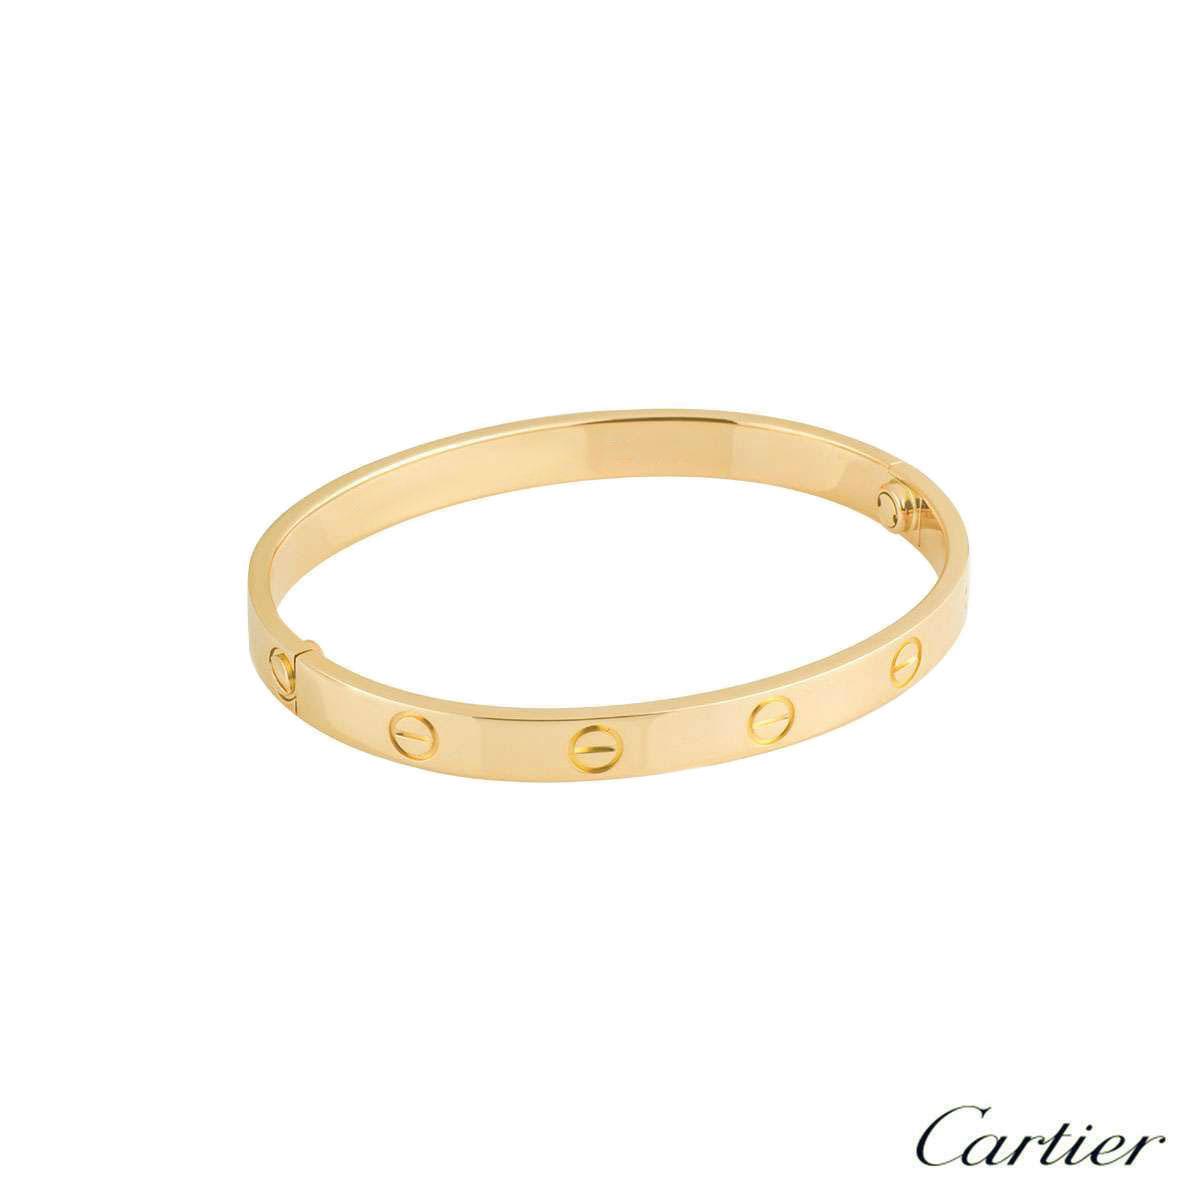 Cartier Yellow Gold Plain Love Bracelet Size 19 B6035519